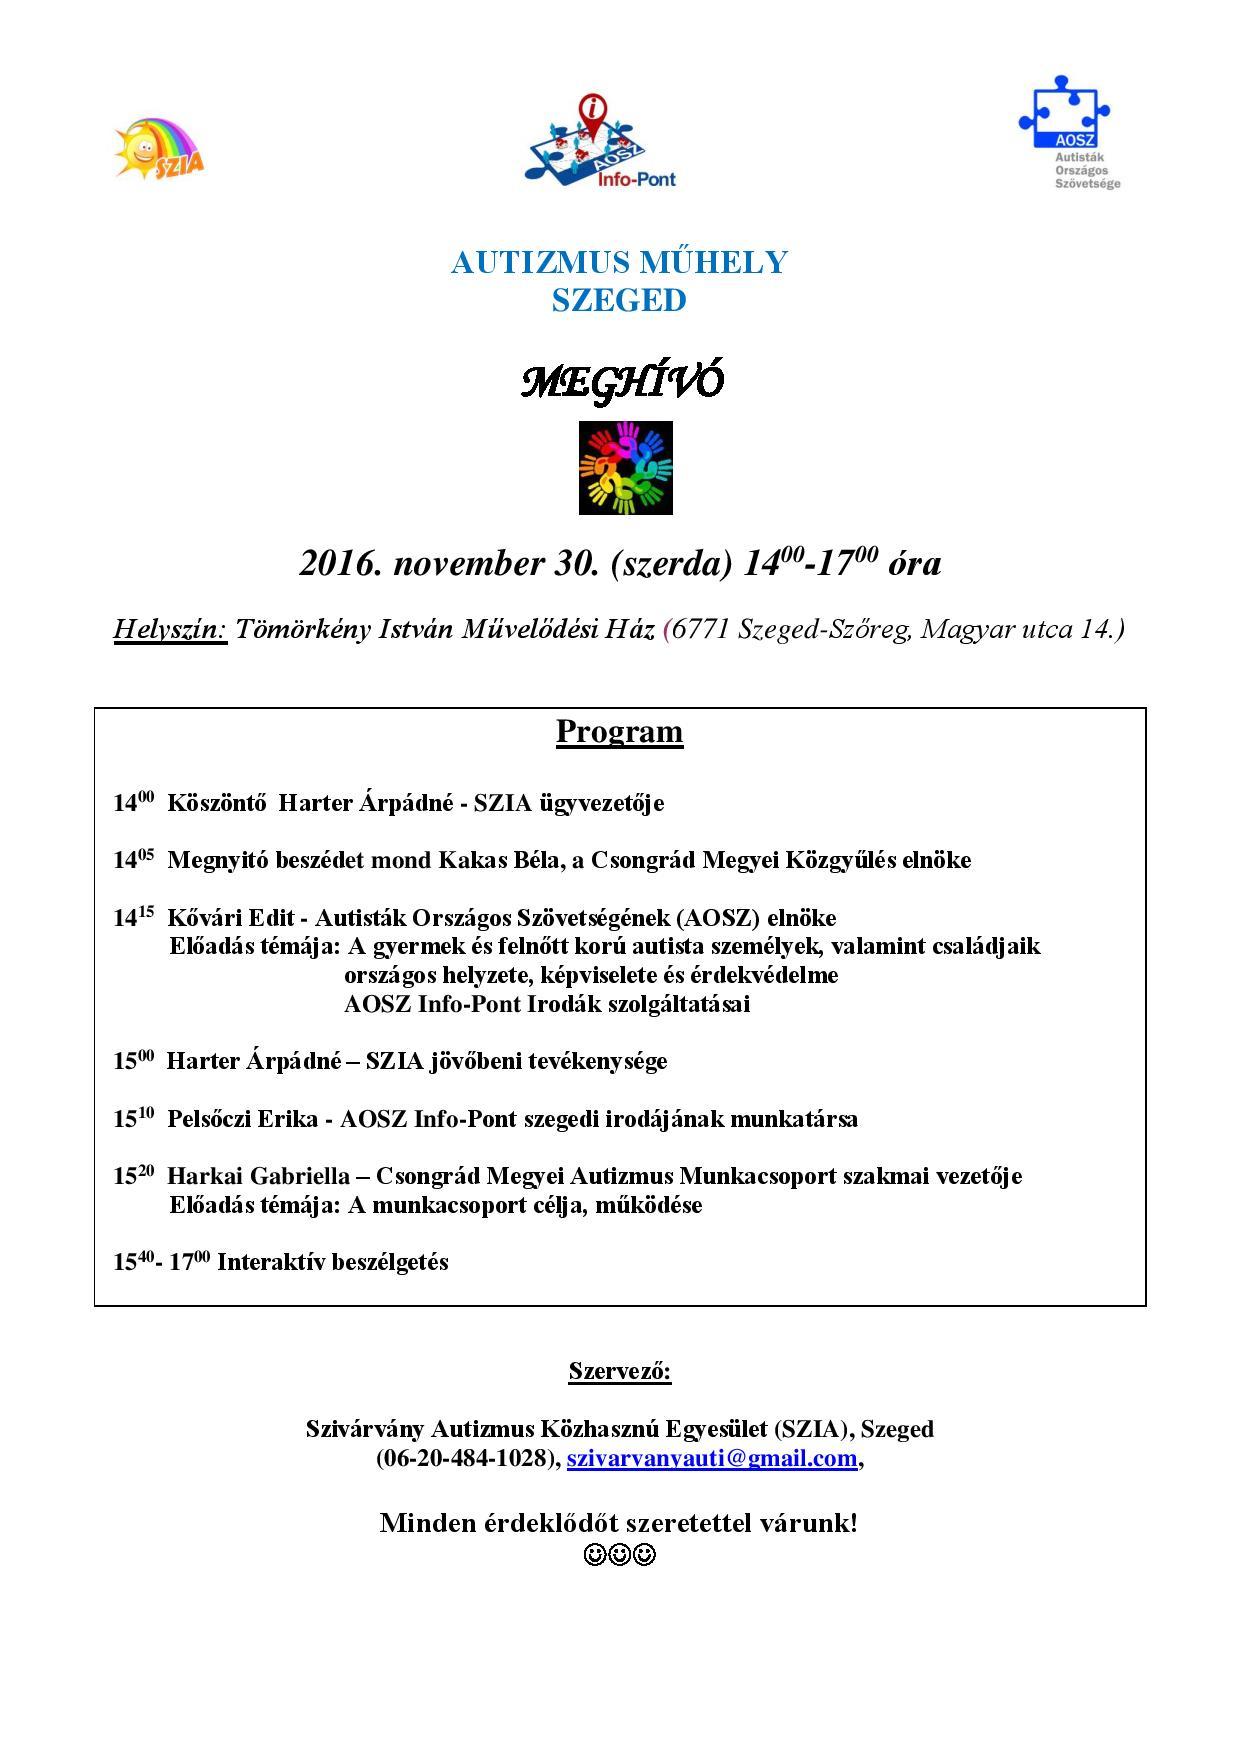 meghivo-2016-11-30-aip-megnyito-szeged